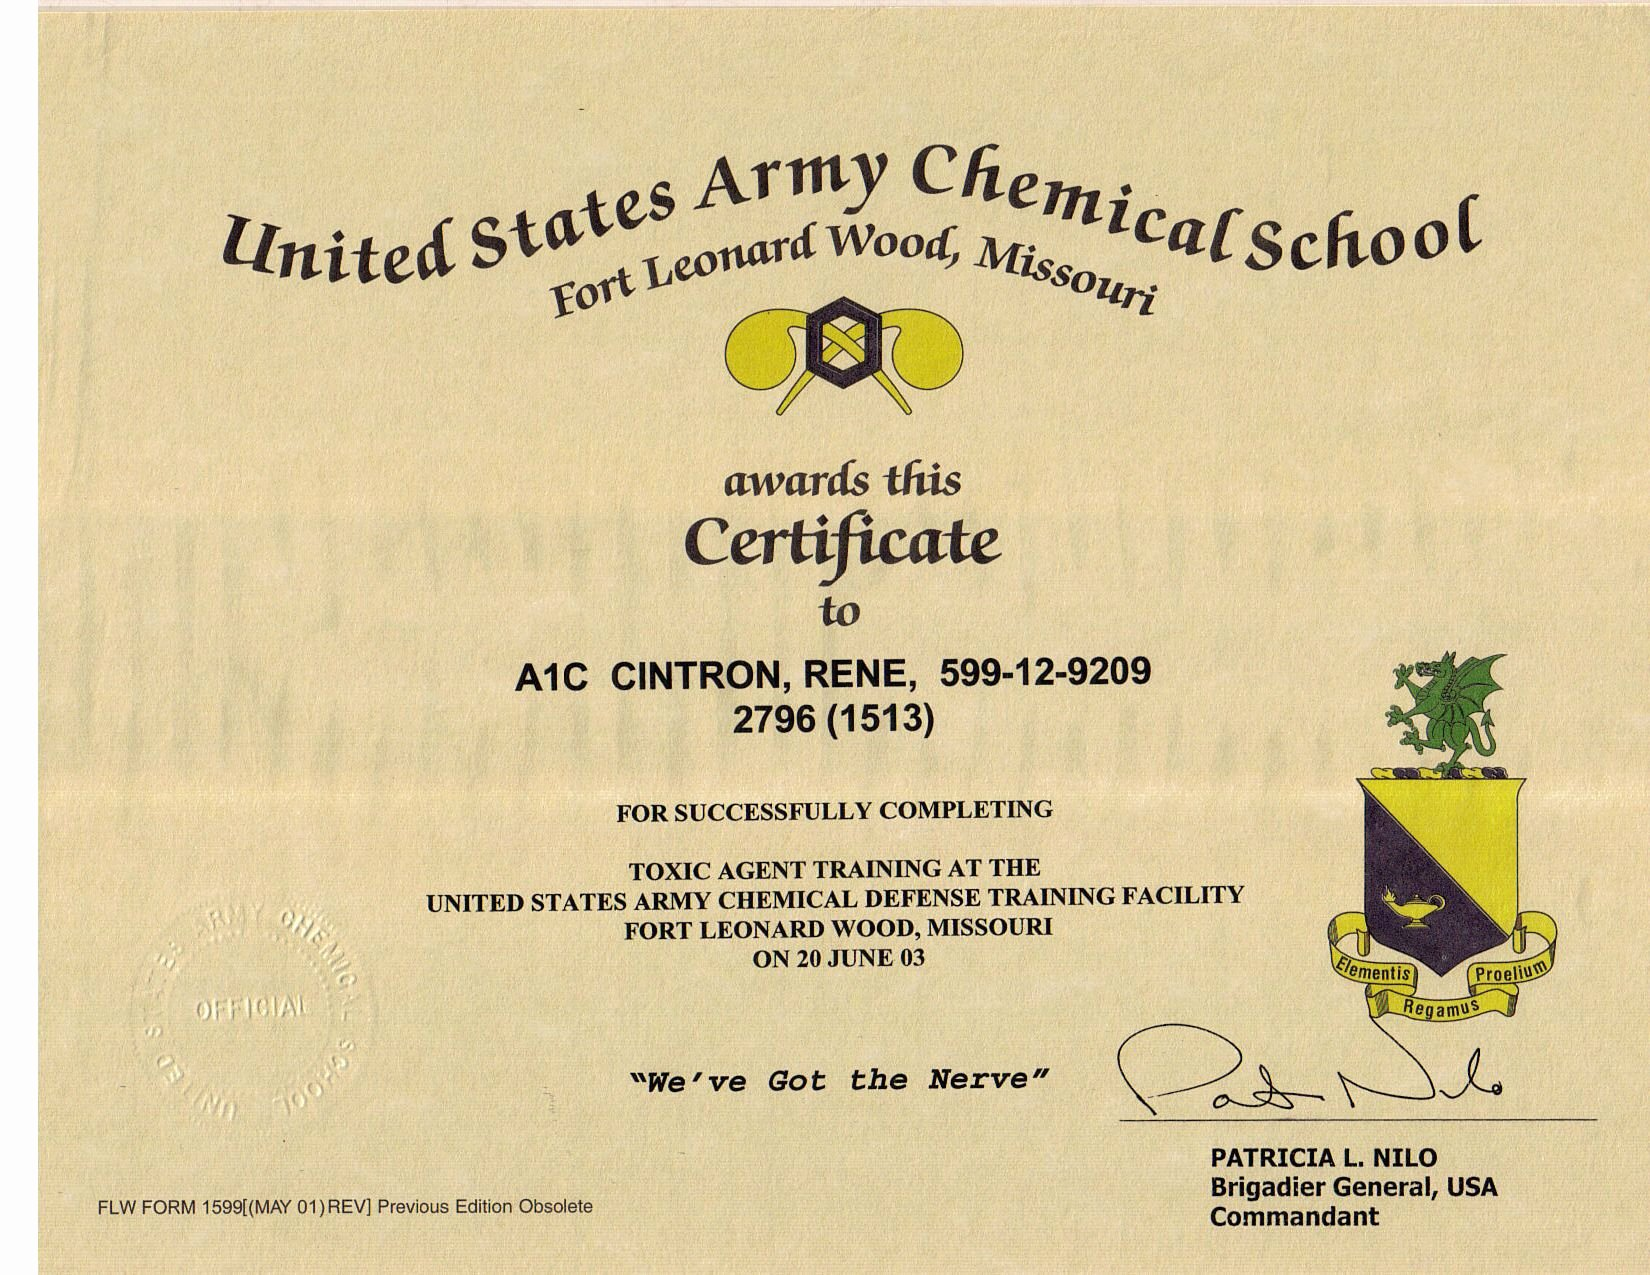 Army Training Schedule form Inspirational Rene Cintron Electronic Portfolio